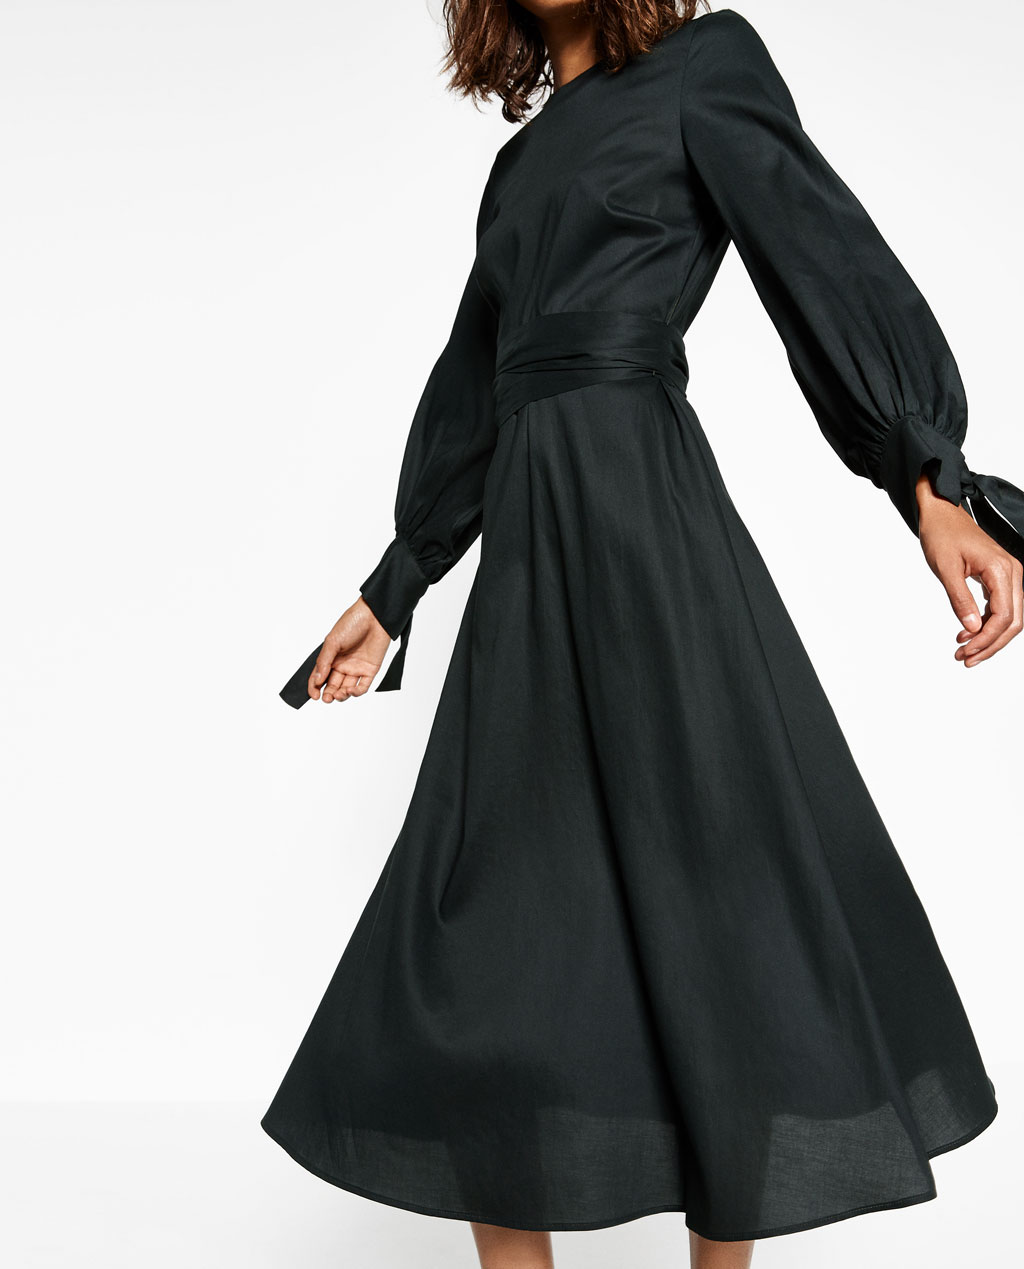 Zara Fitted Dress.jpg